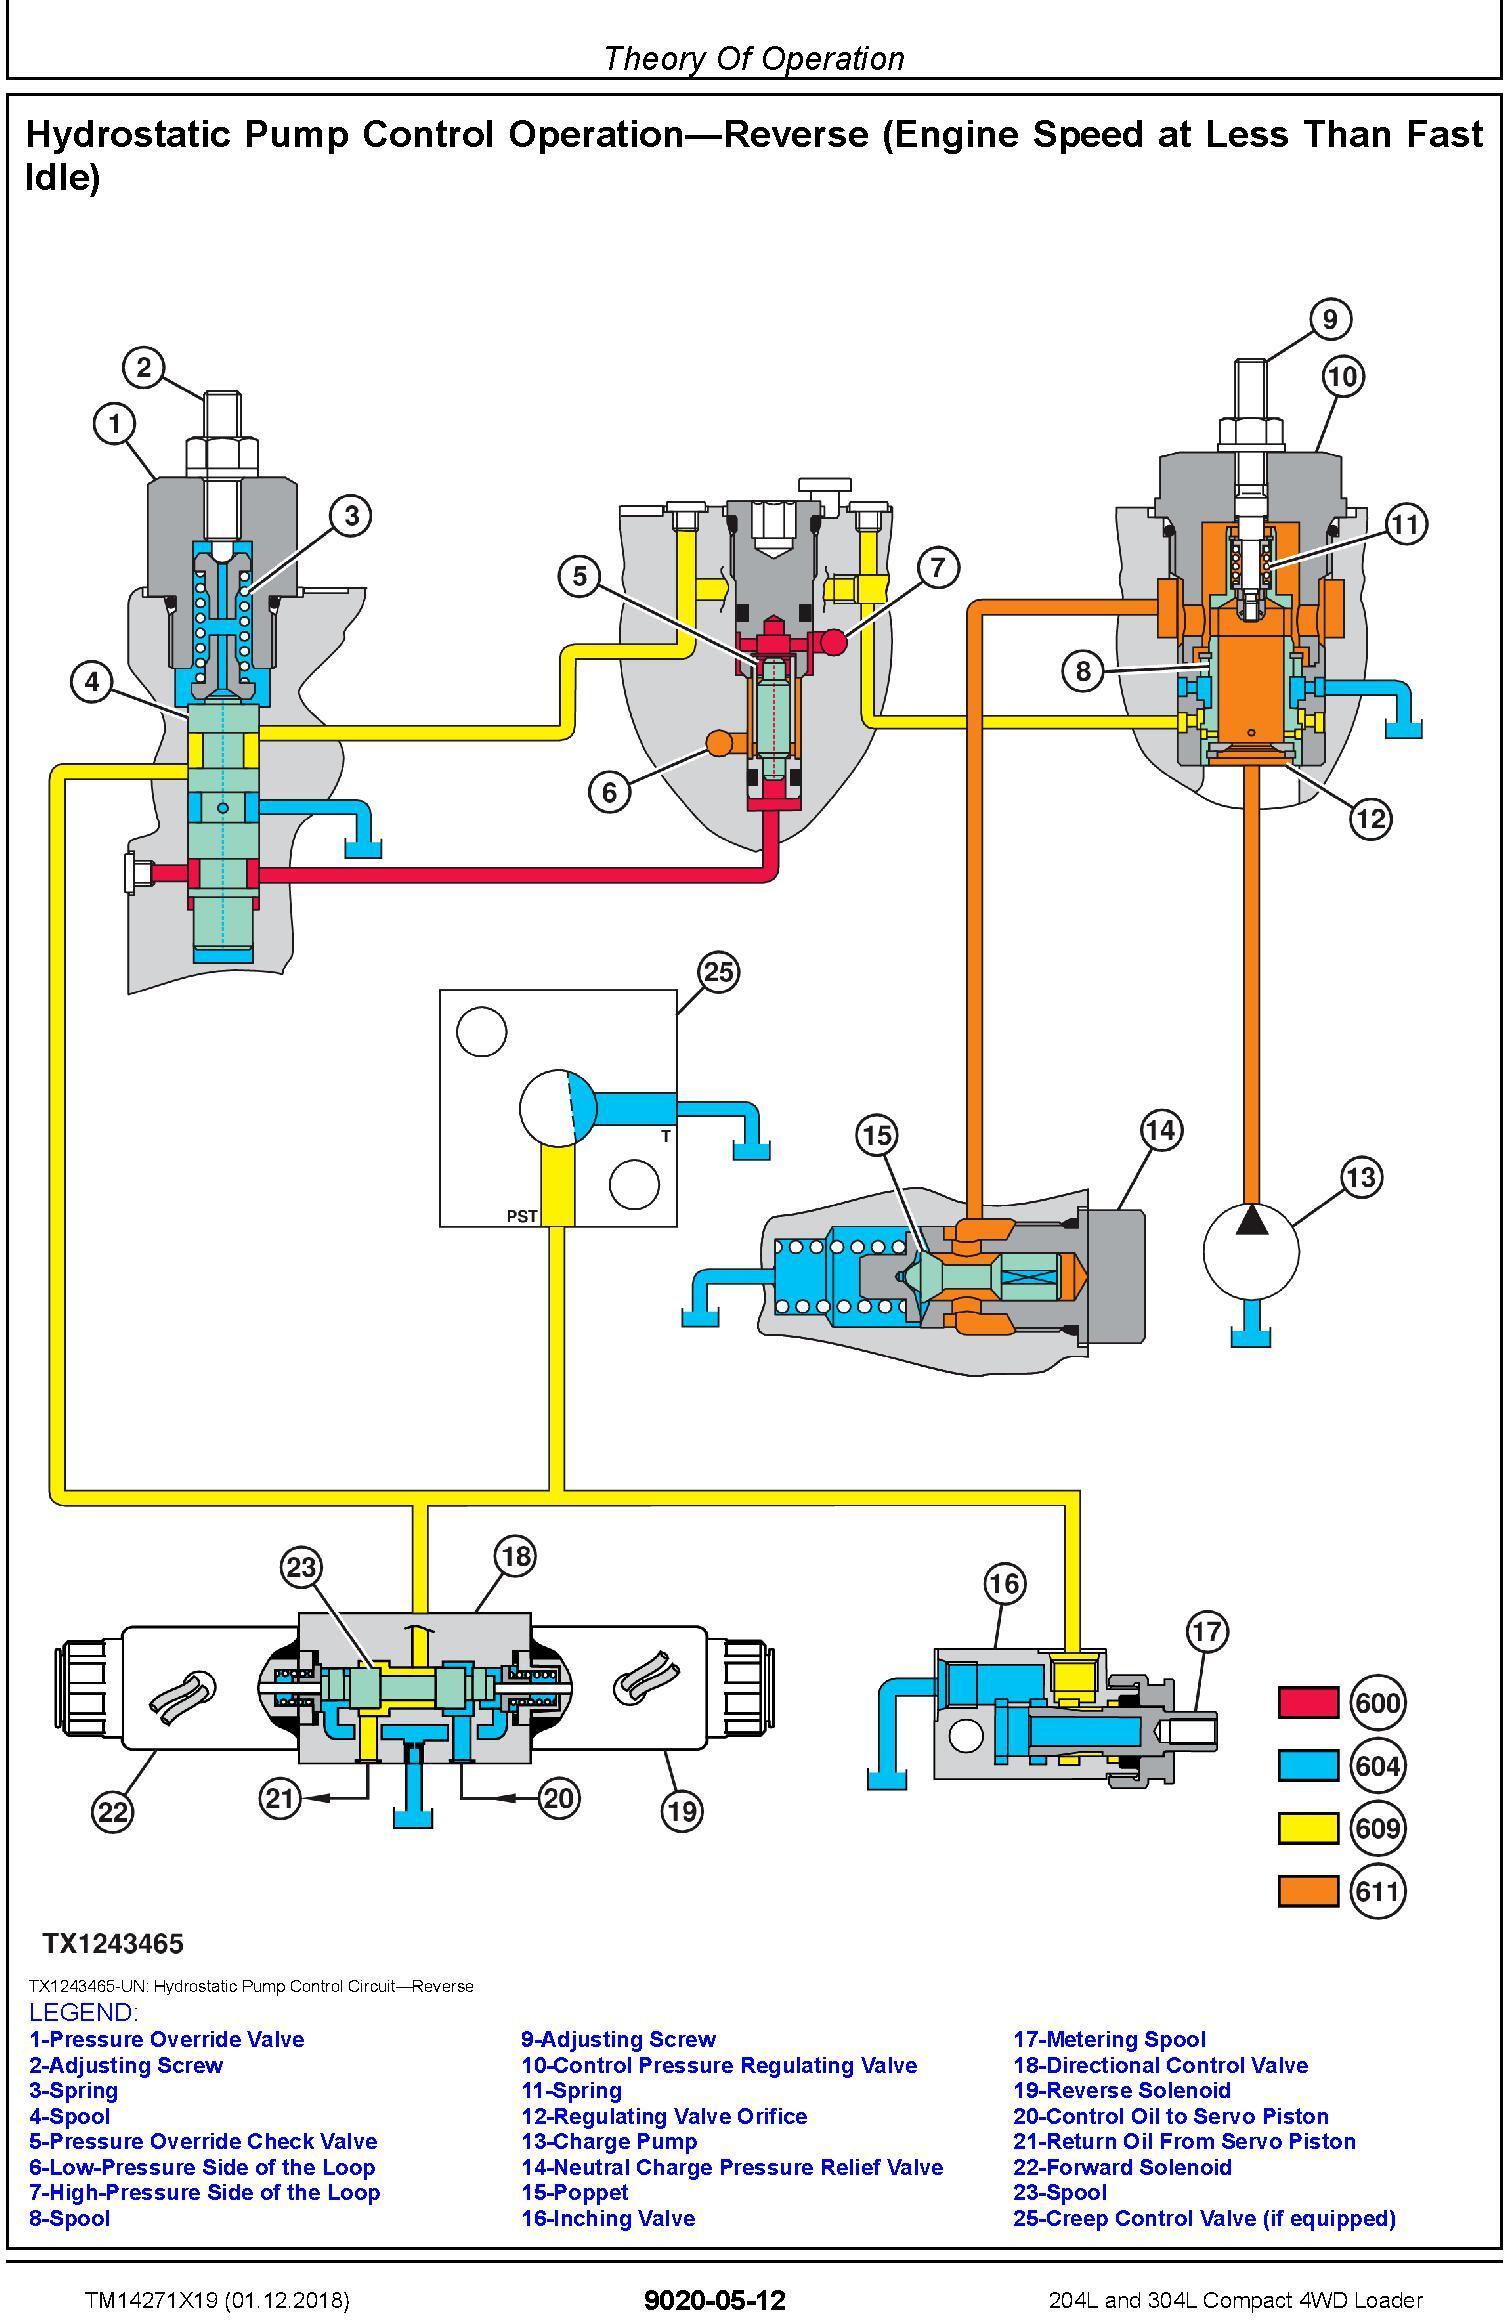 John Deere 204L,304L (SN.B040073-) Compact 4WD Loader Operation & Test Technical Manual (TM14271X19) - 1